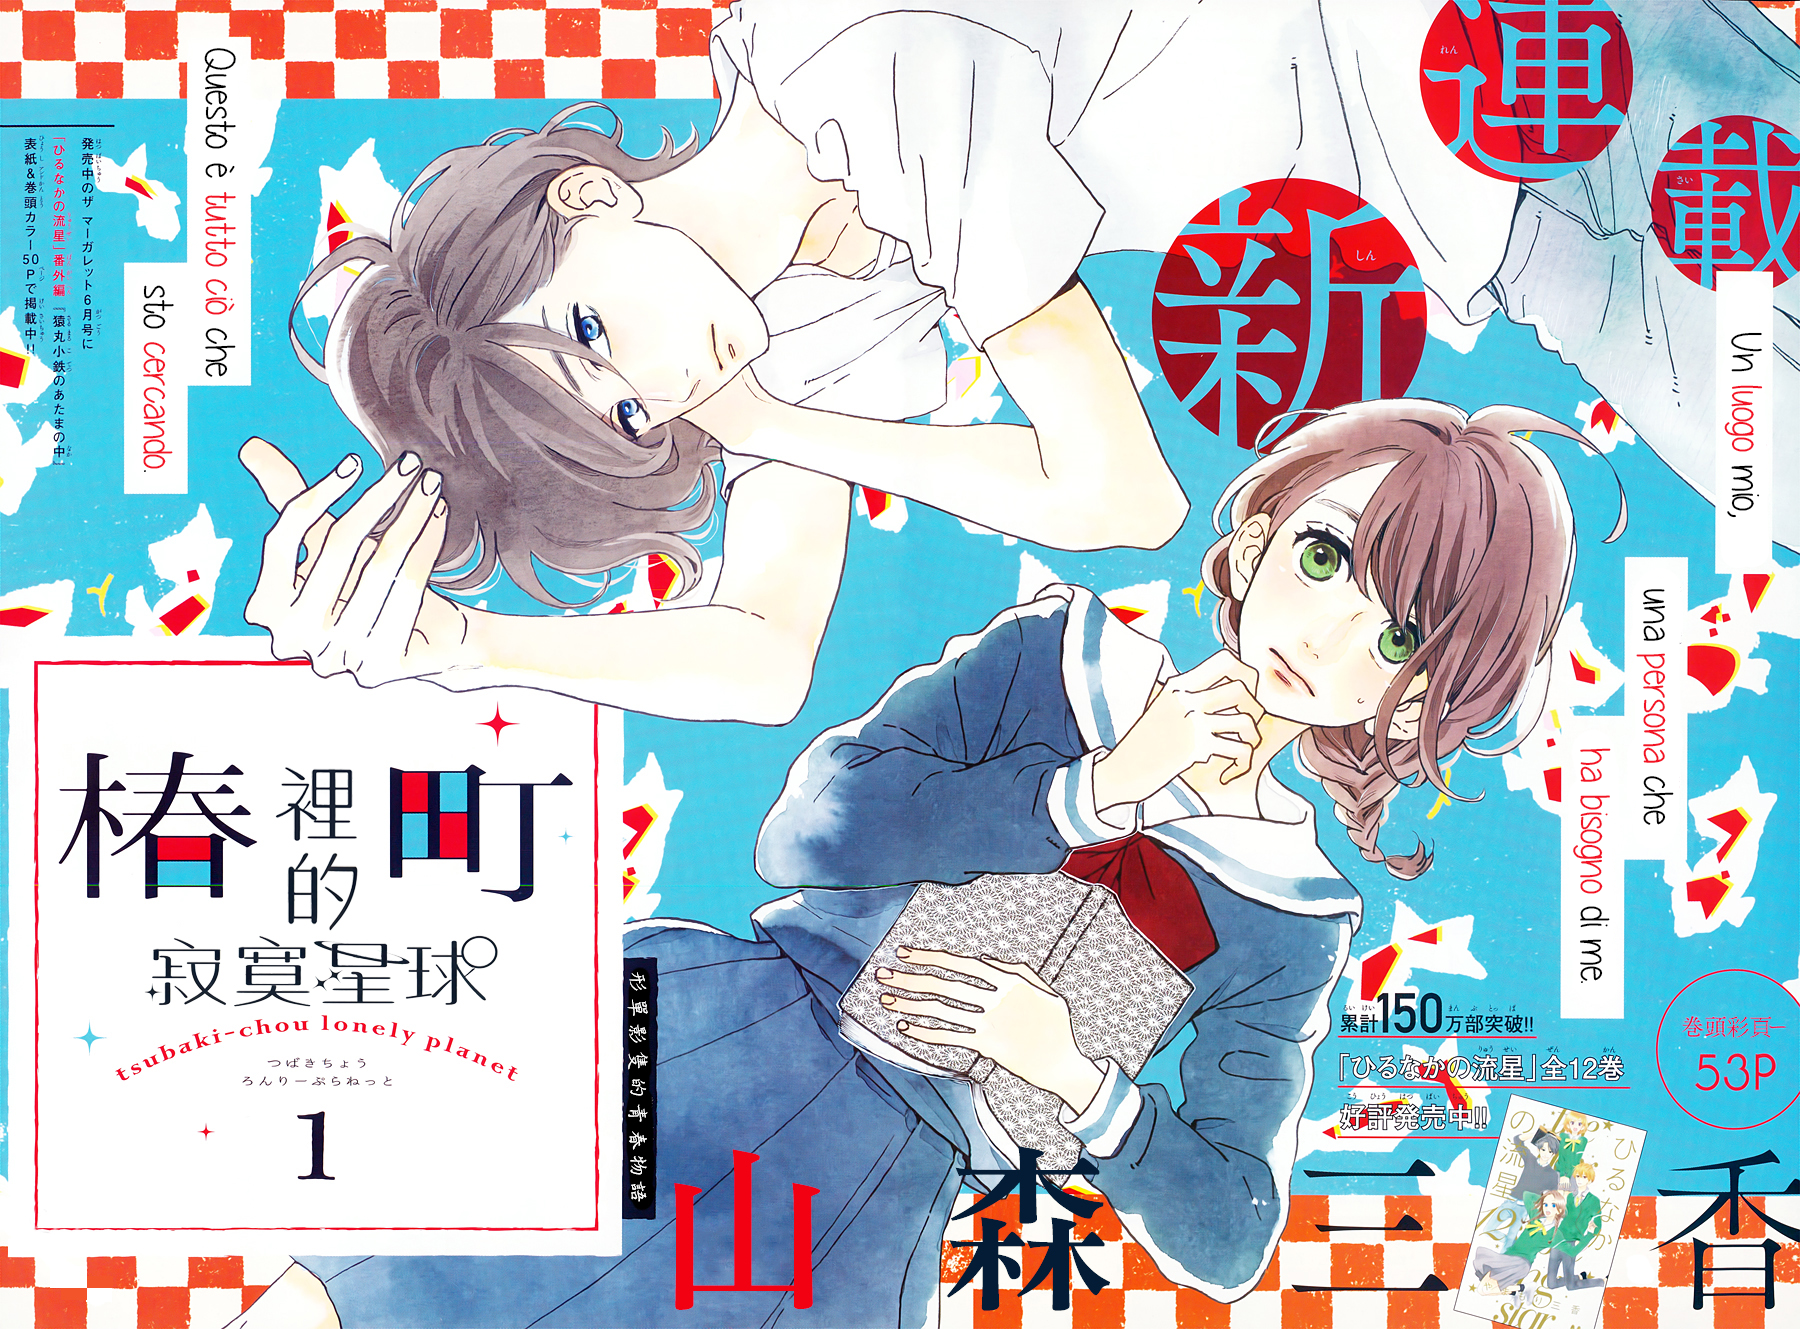 Tsubaki-chou Lonely Planet - vol 1 ch 1 Page 5 | Batoto!